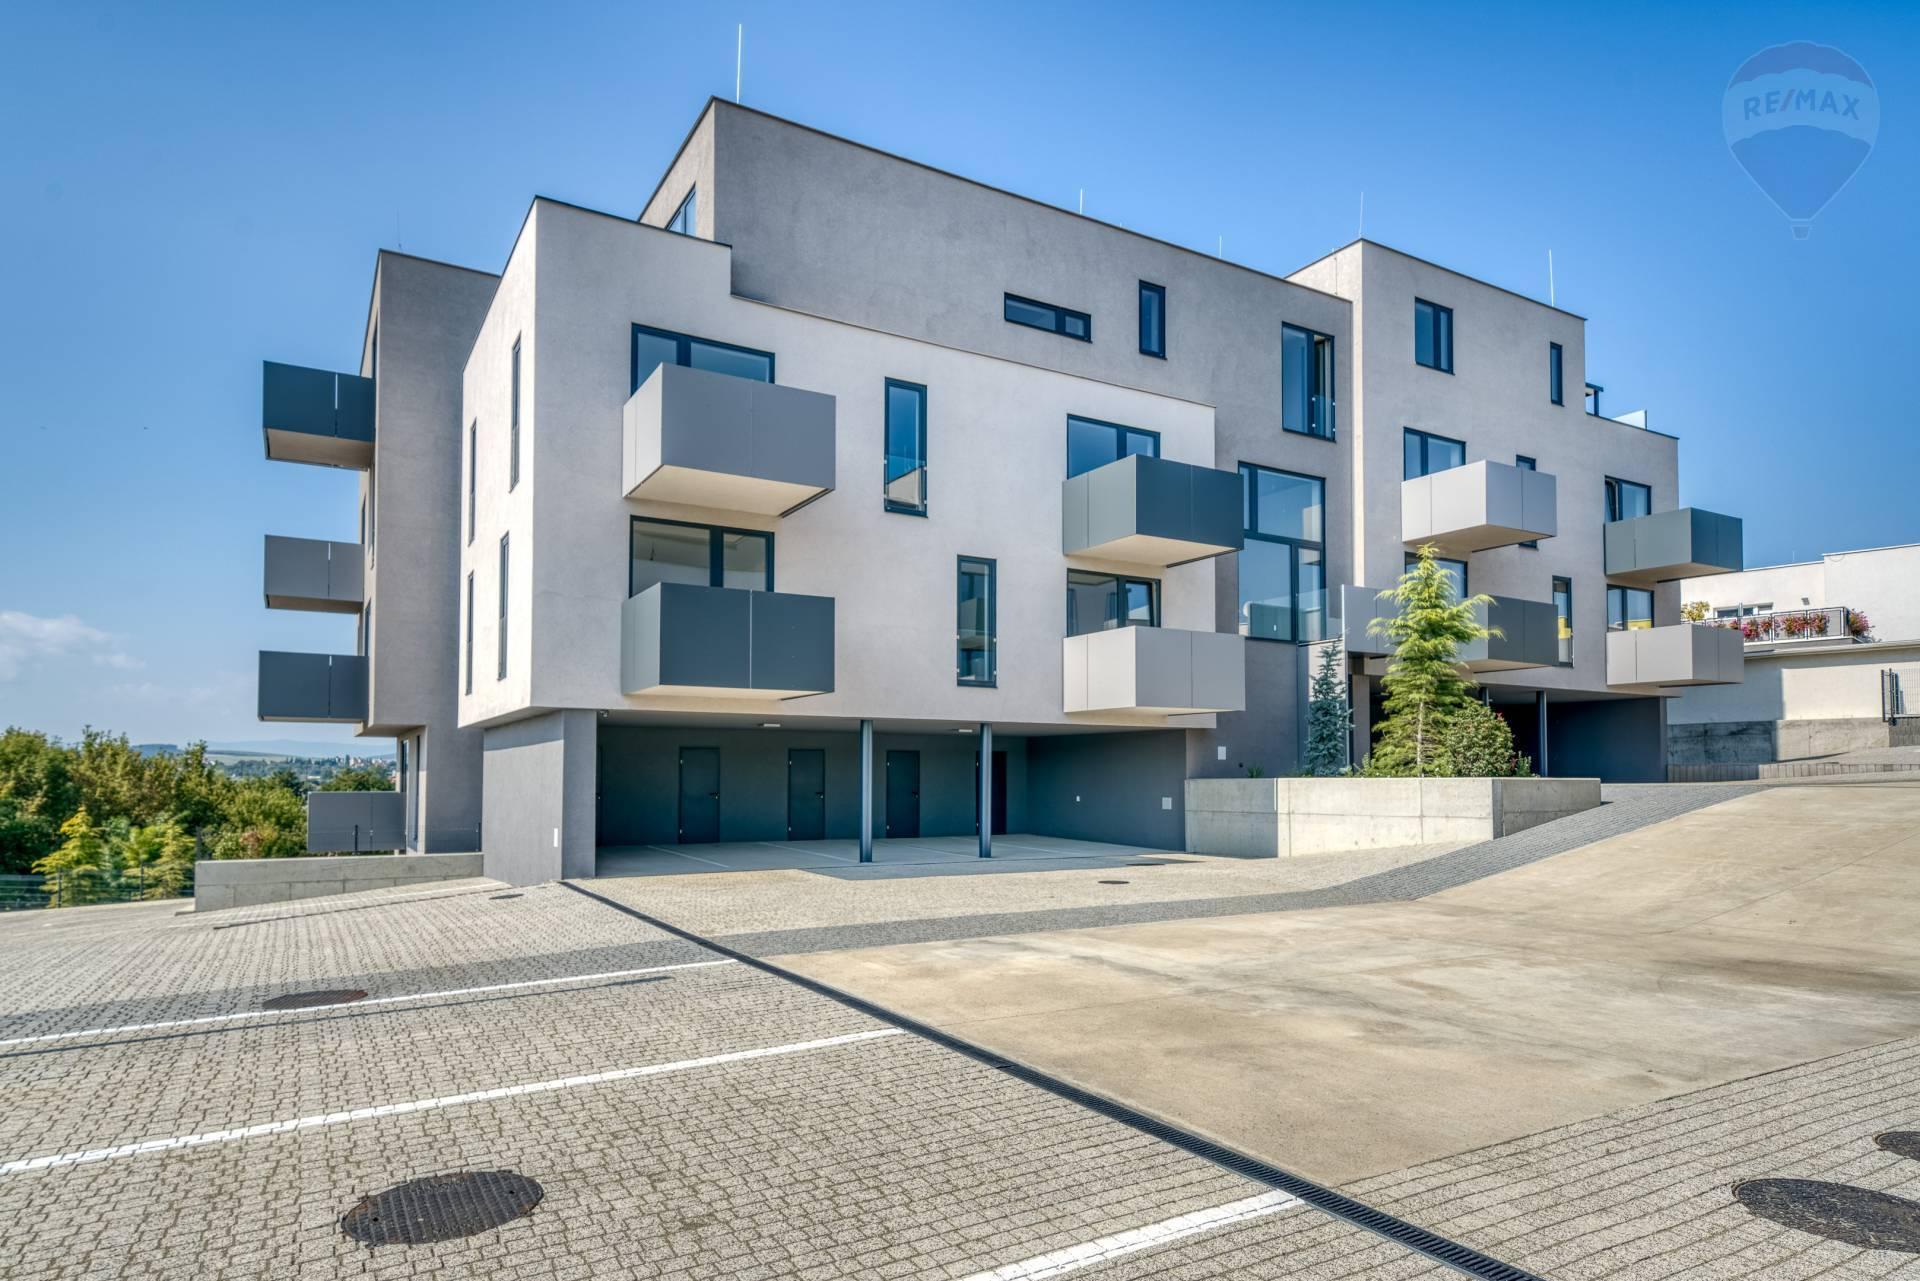 4 izbový byt na predaj, novostavba, projekt Viladomy Ľubotice